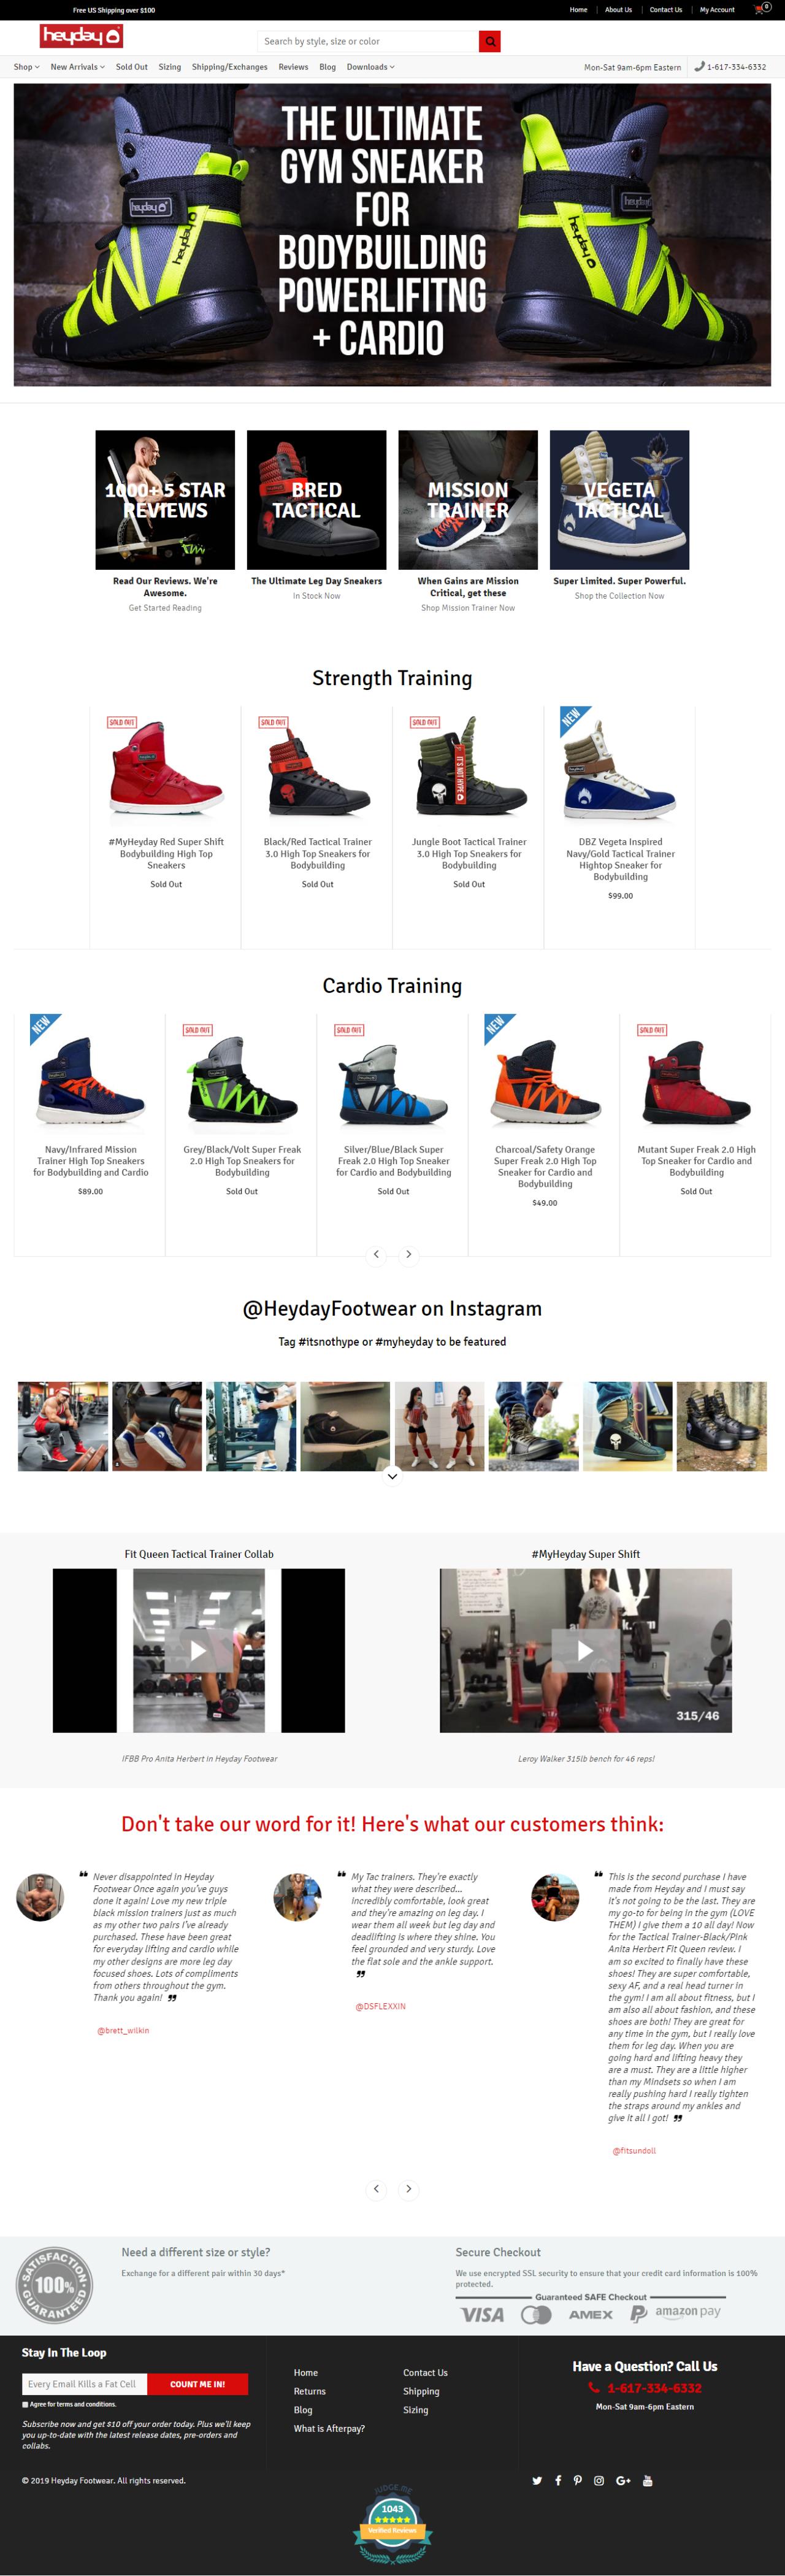 Hayday Footwear